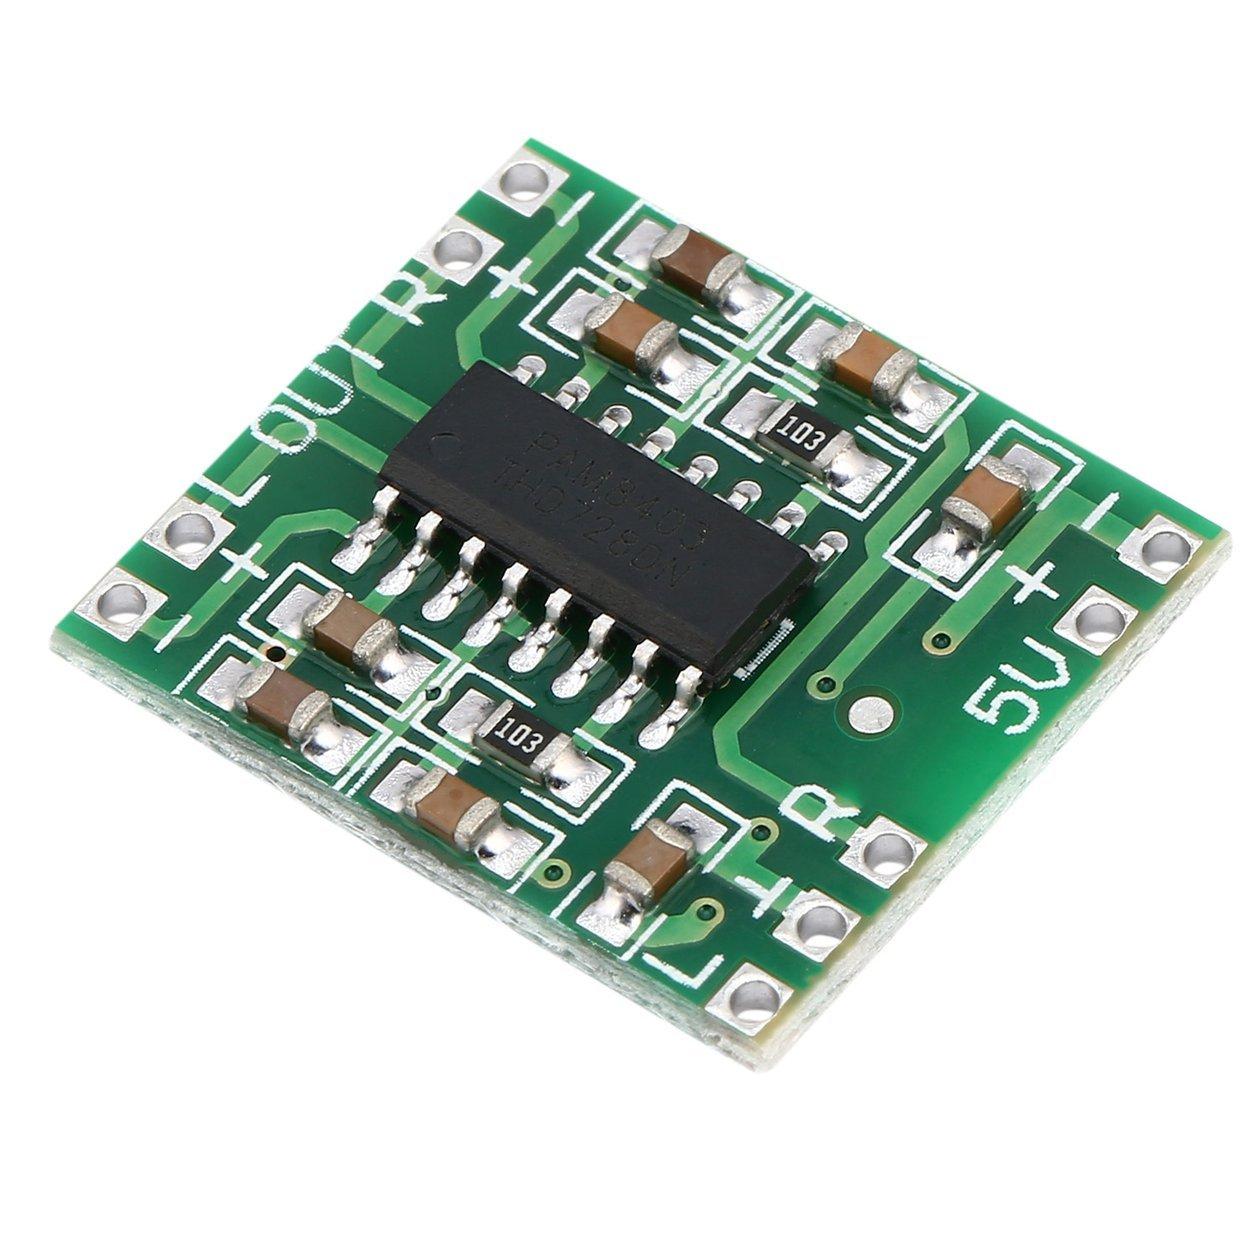 Color: Verde 2 Canales 3W Digital Power PAM8403 Tablero Amplificador de Audio de Clase D USB DC 5V Mini Tablero Amplificador Digital de Clase D LCD